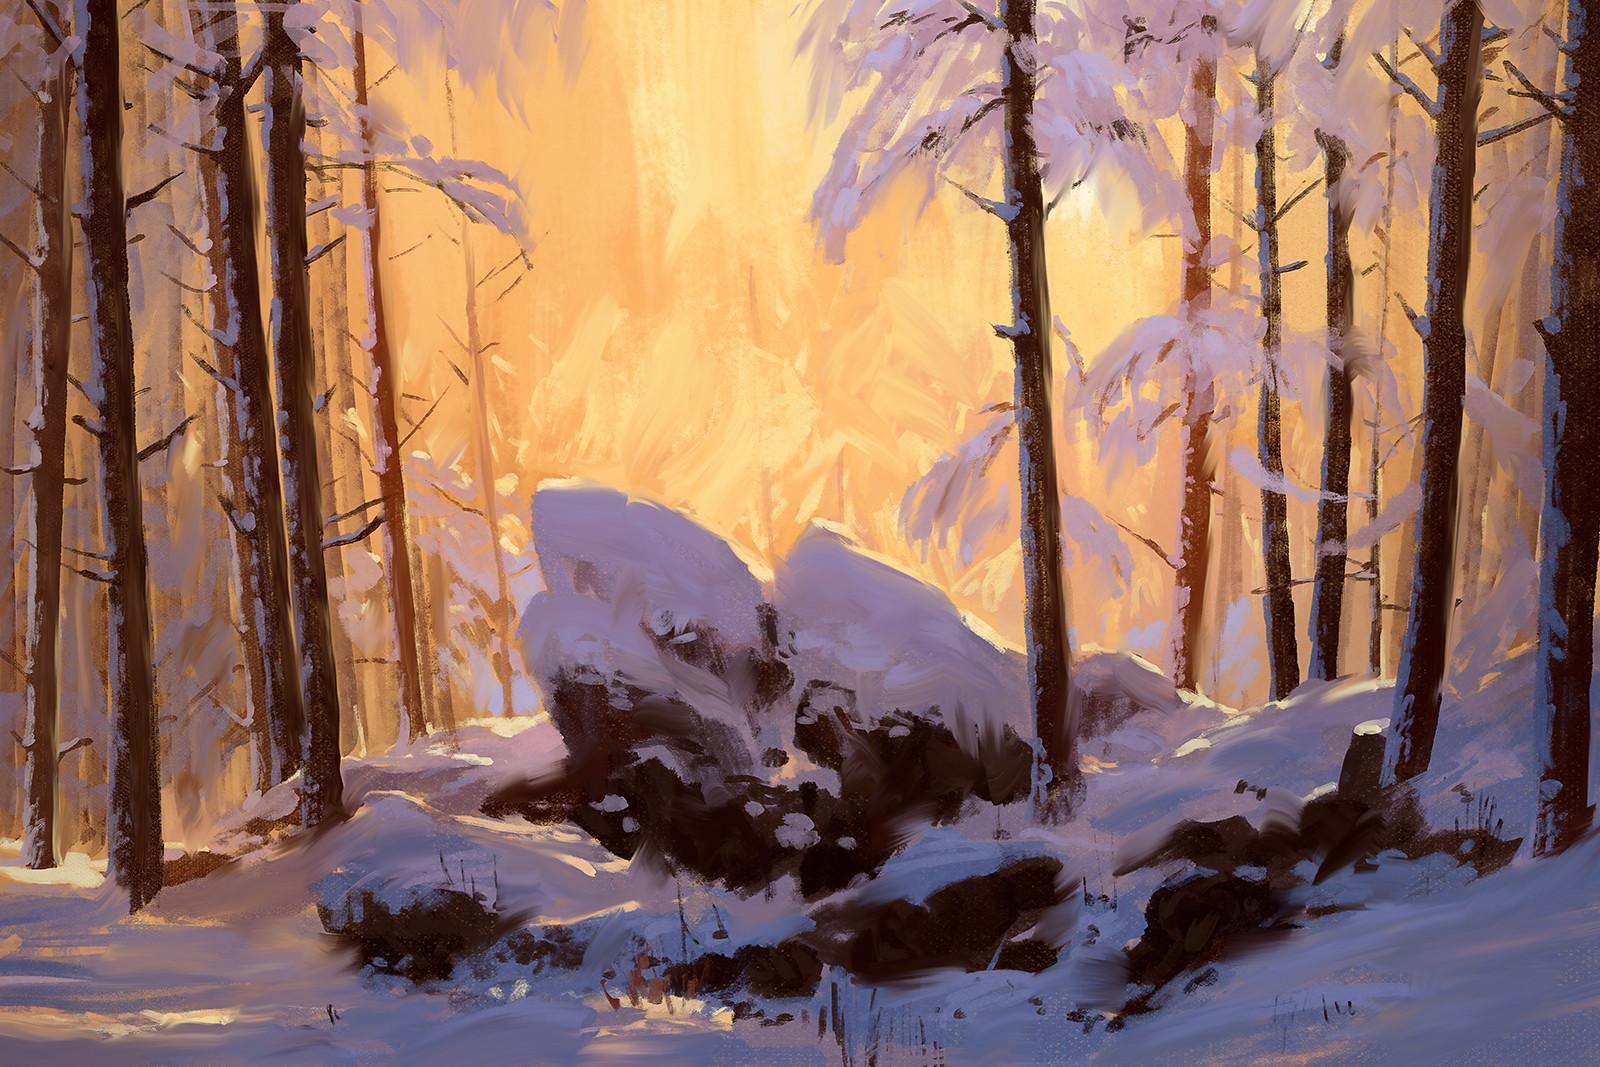 Bram sels snow study bram sels